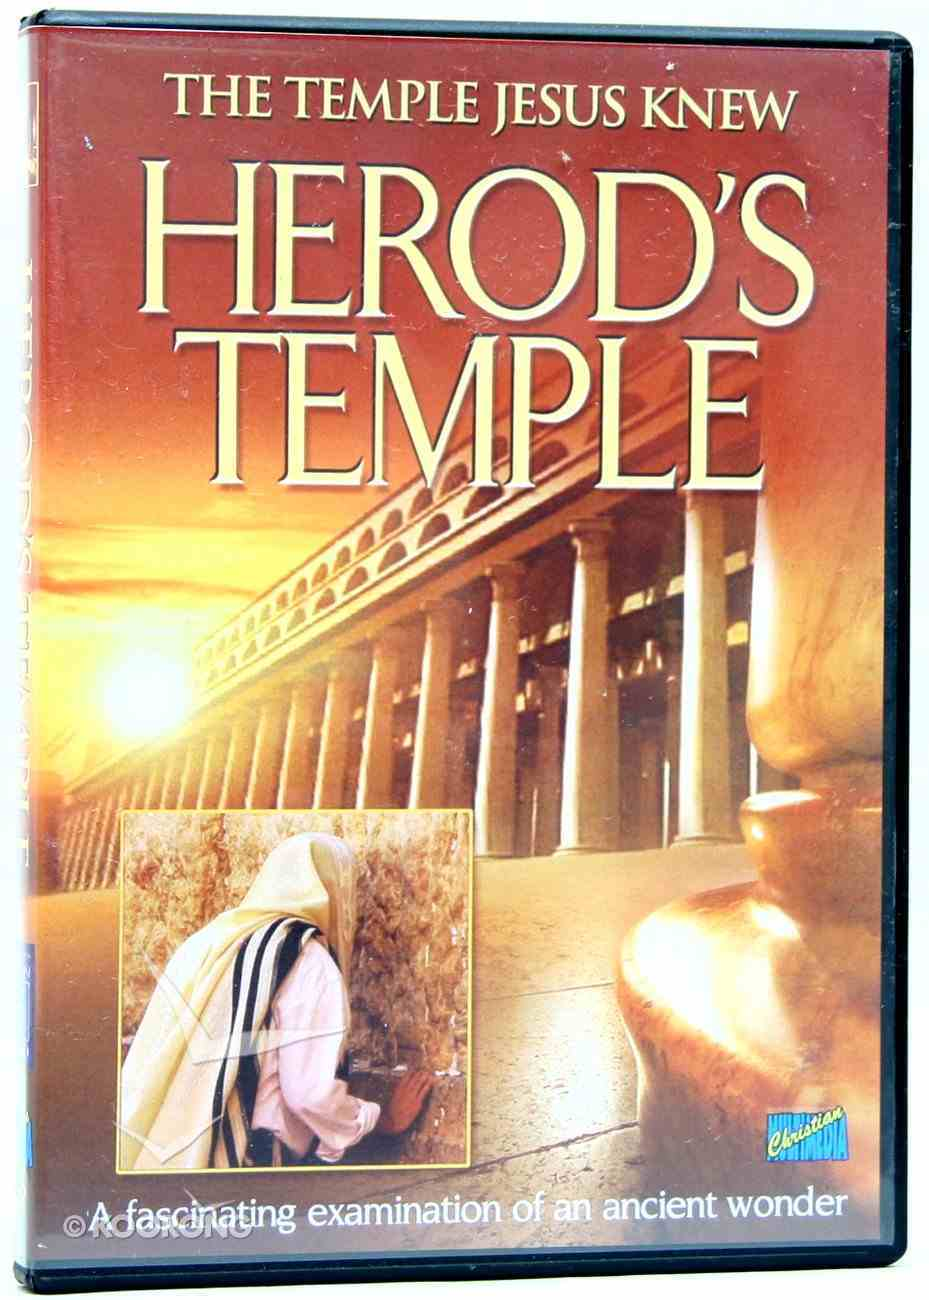 Herod's Temple DVD